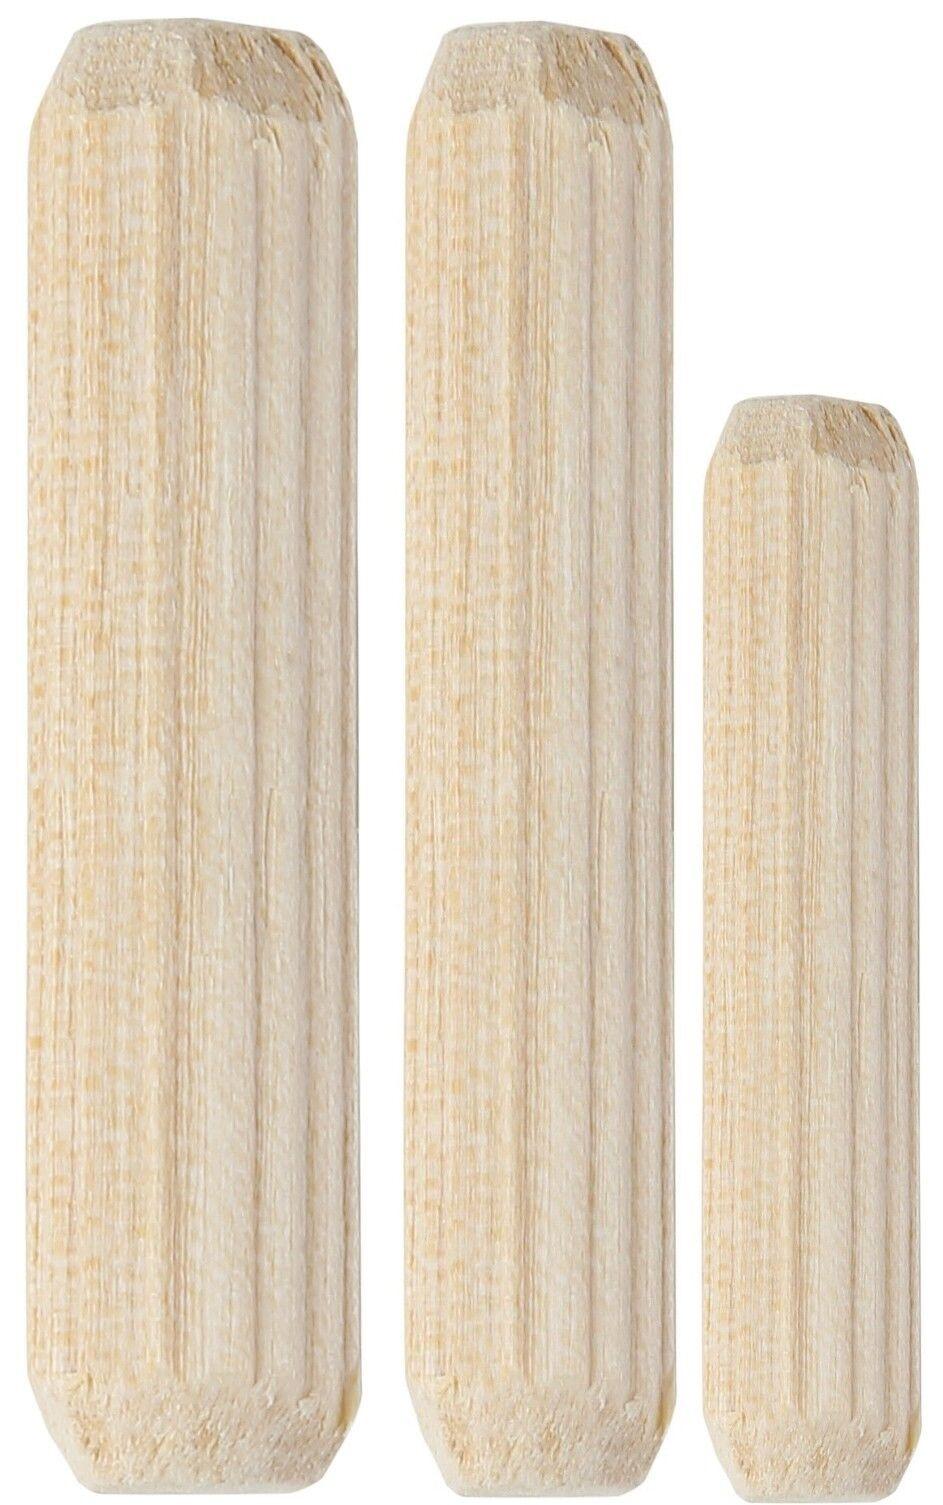 200 Stk. Holzdübel, Buche, Riffeldübel, Holzstifte - 6x35 mm, 8x35 mm, 10x45mm